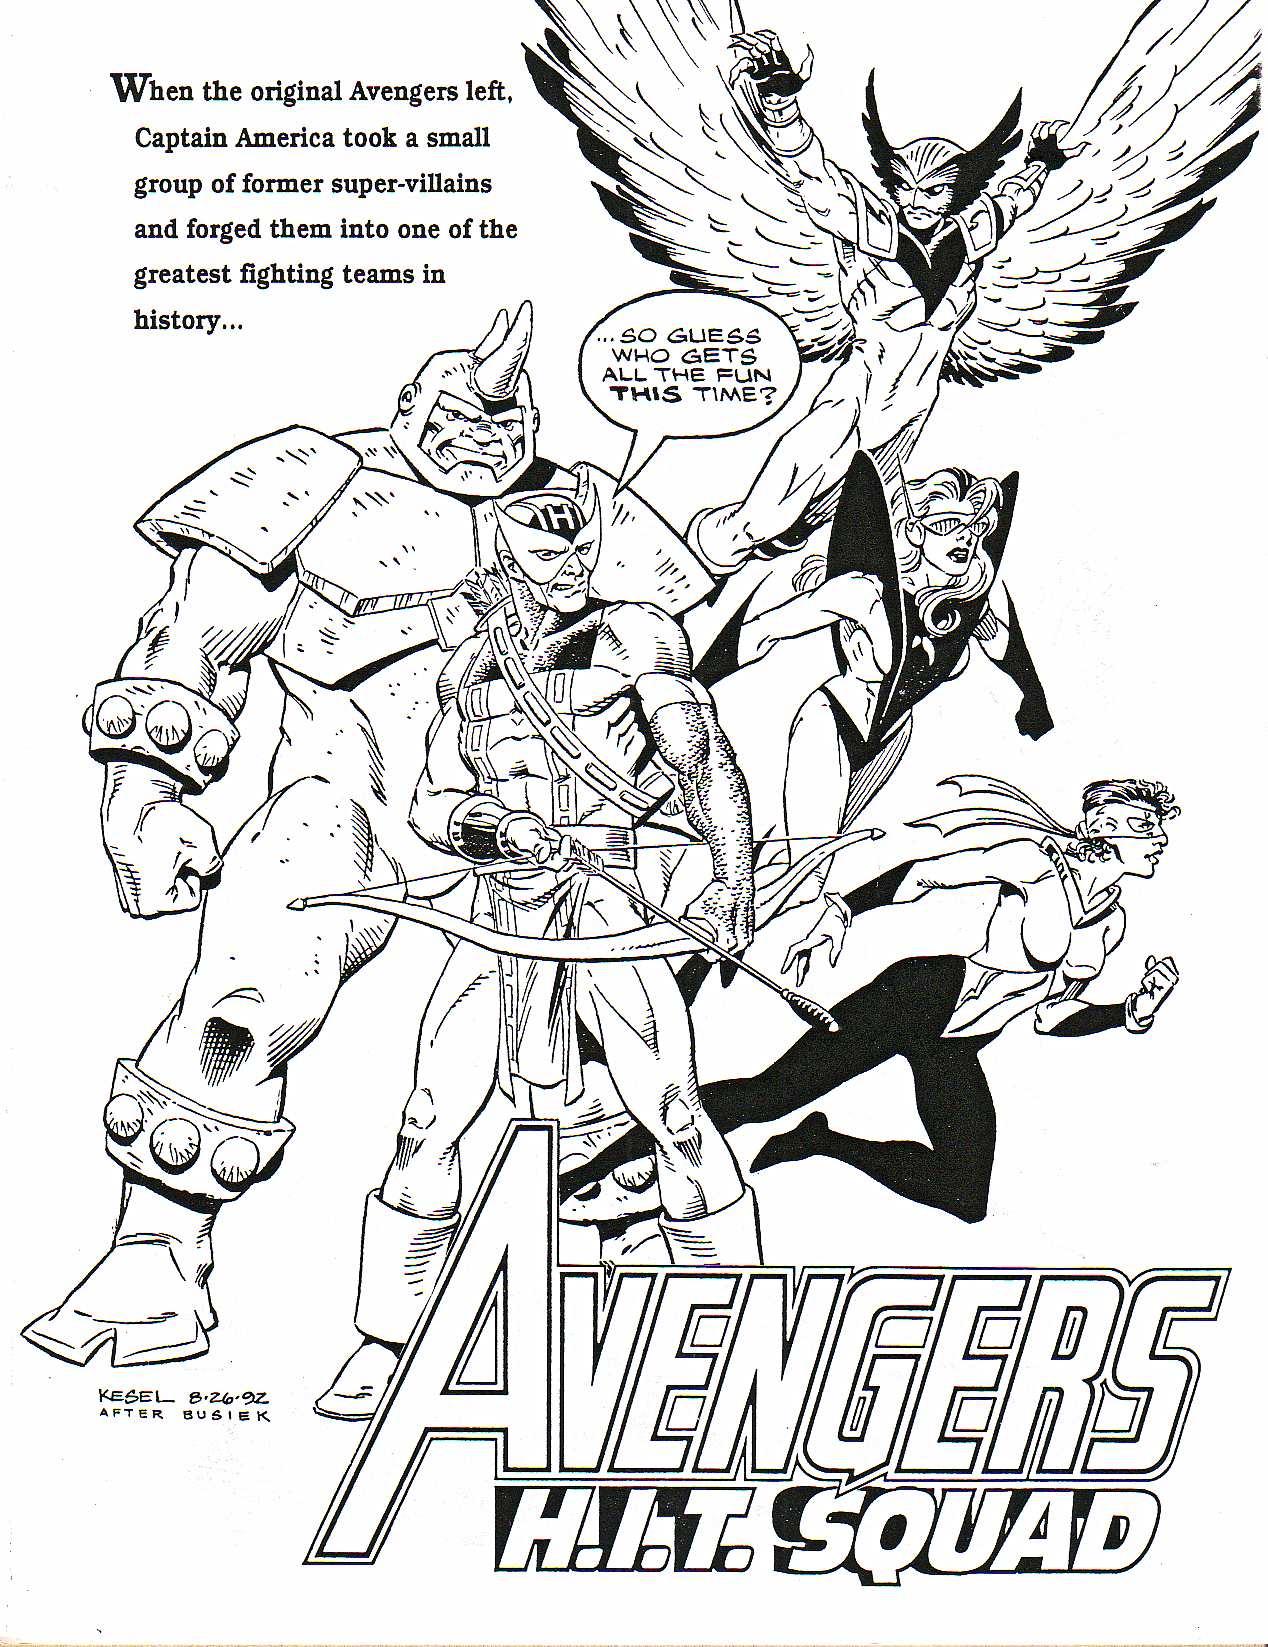 AvengersHITSquad.JPG